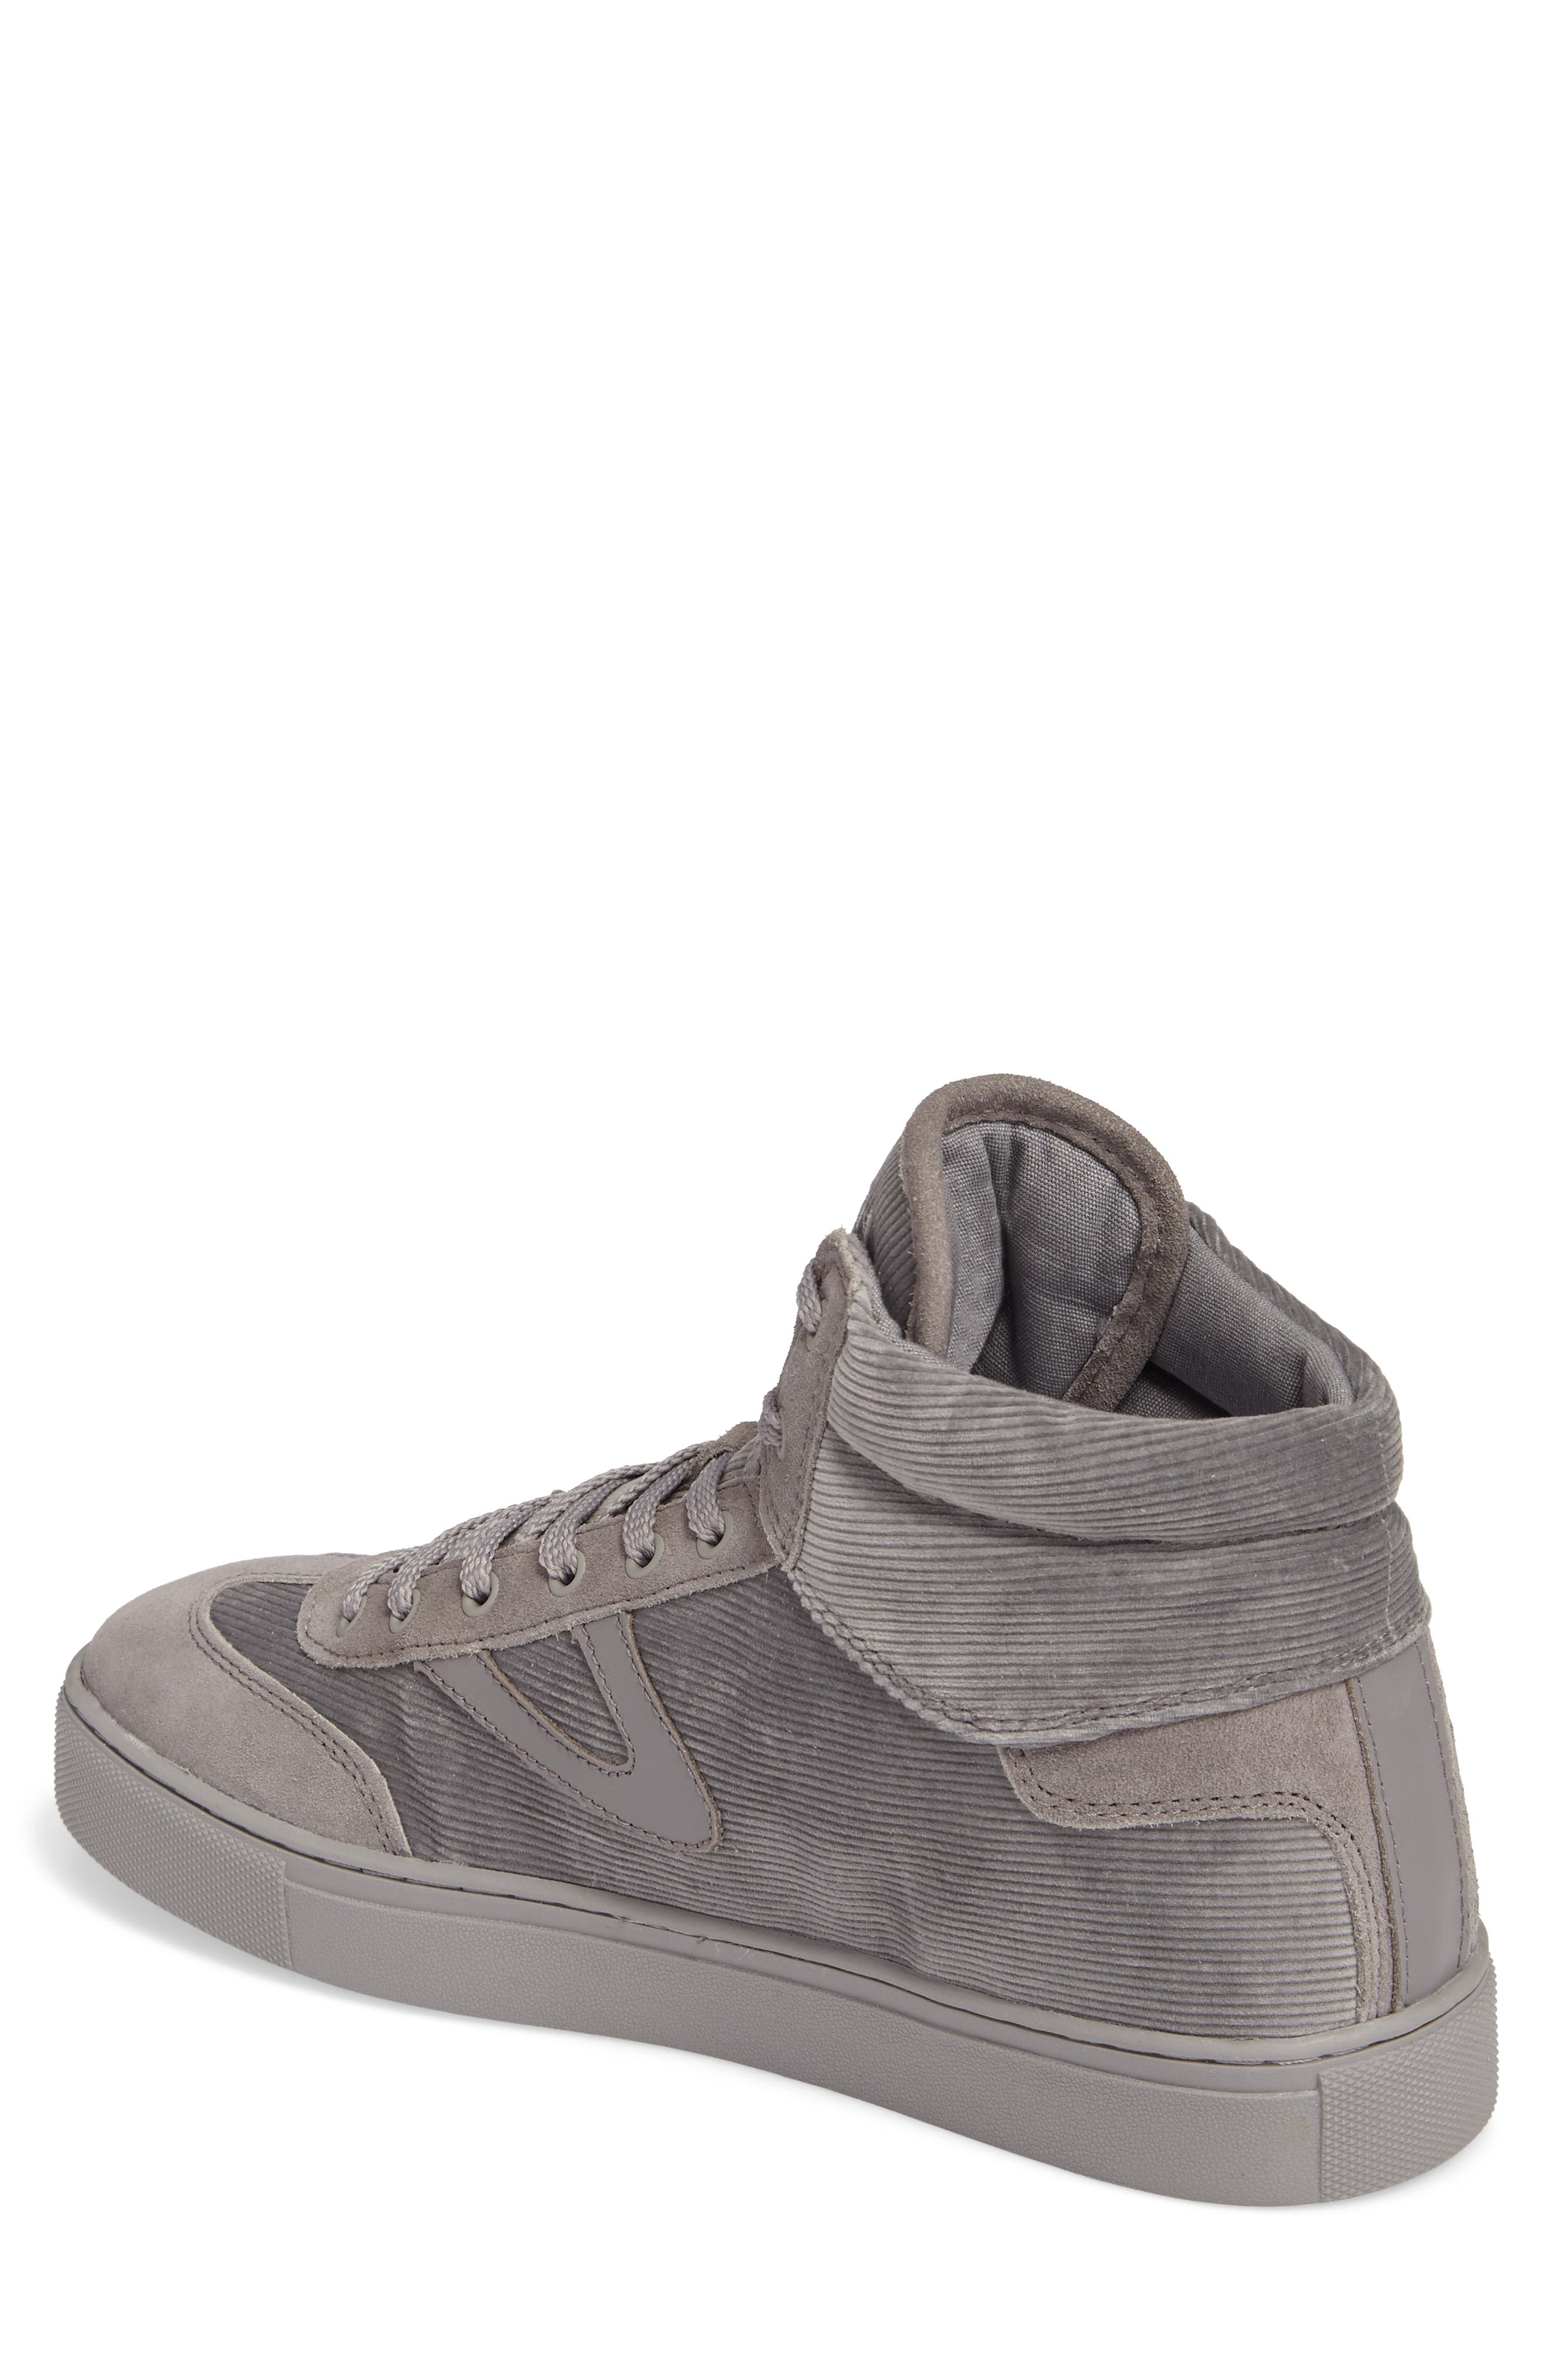 Jack High Top Sneaker,                             Alternate thumbnail 2, color,                             Grey/ Grey